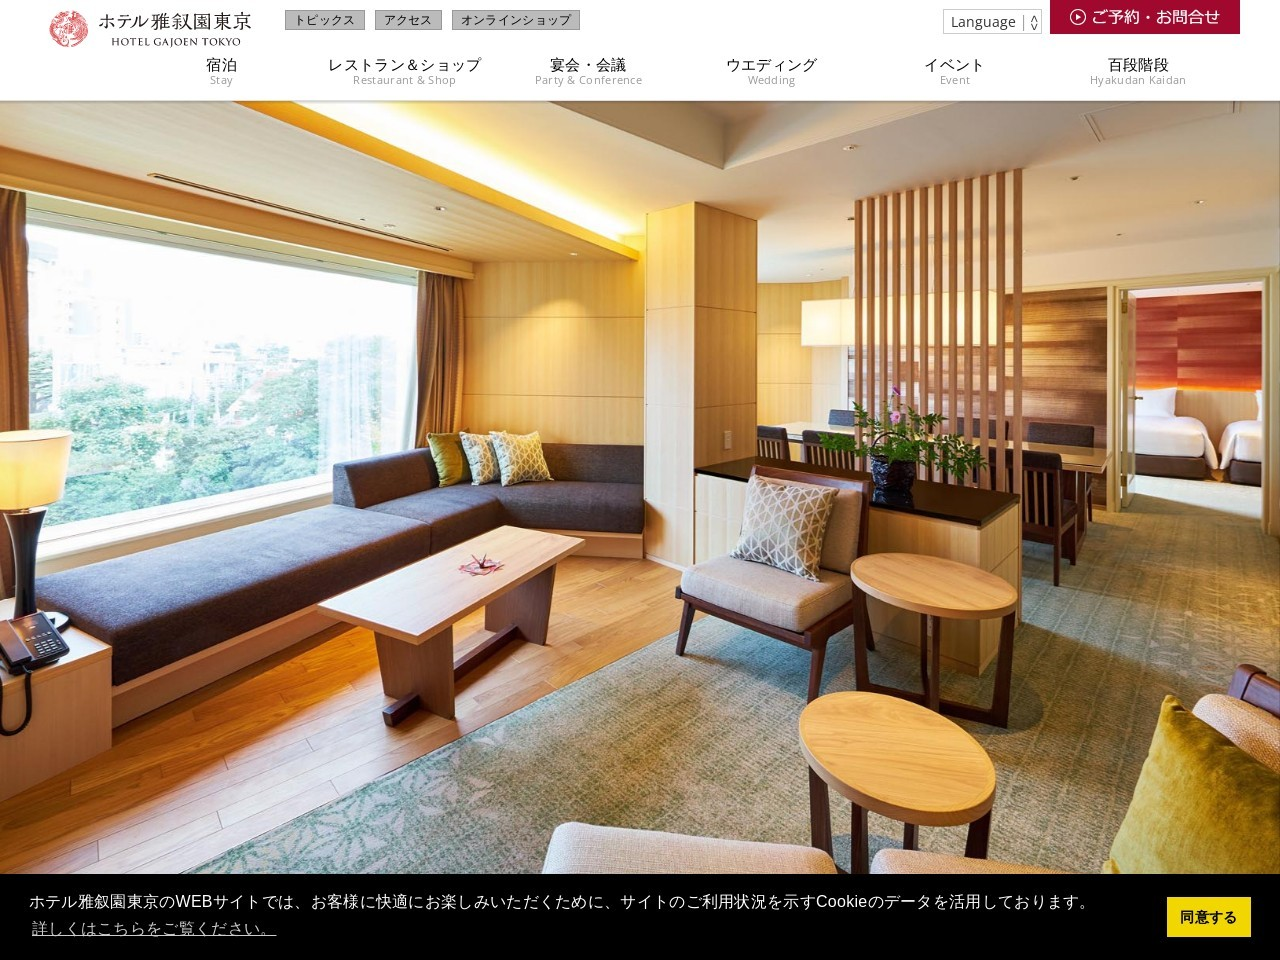 https://www.hotelgajoen-tokyo.com/recruit